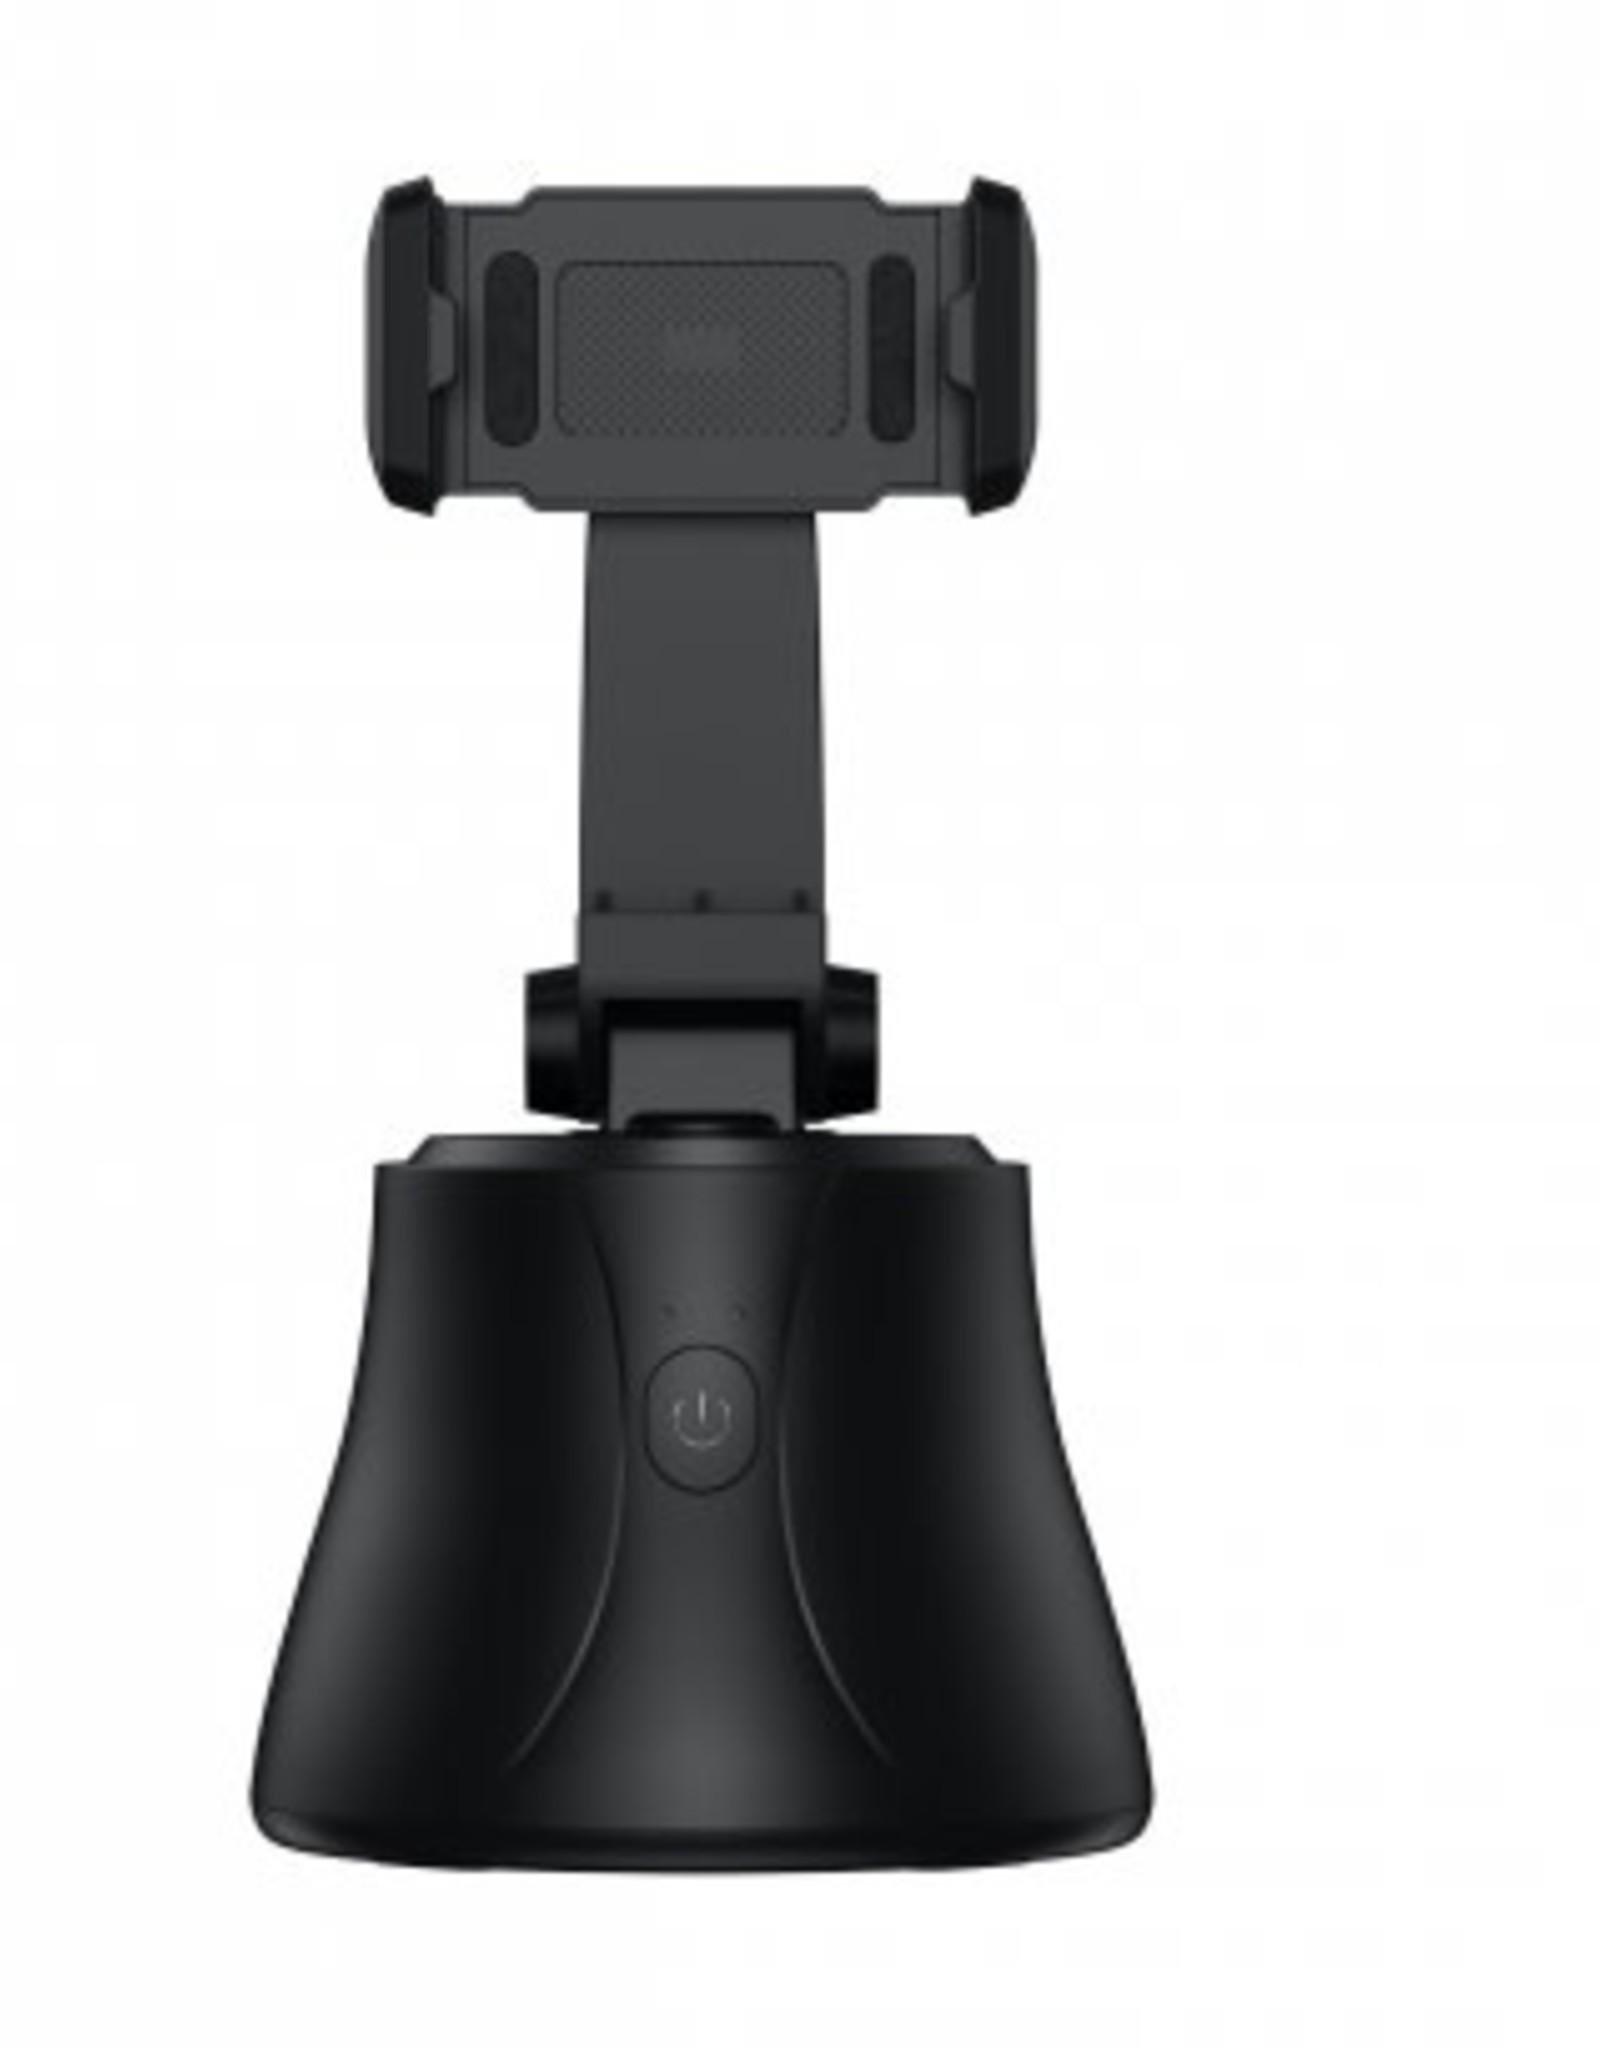 Baseus 360°AI Following Shot Tripod Head Black